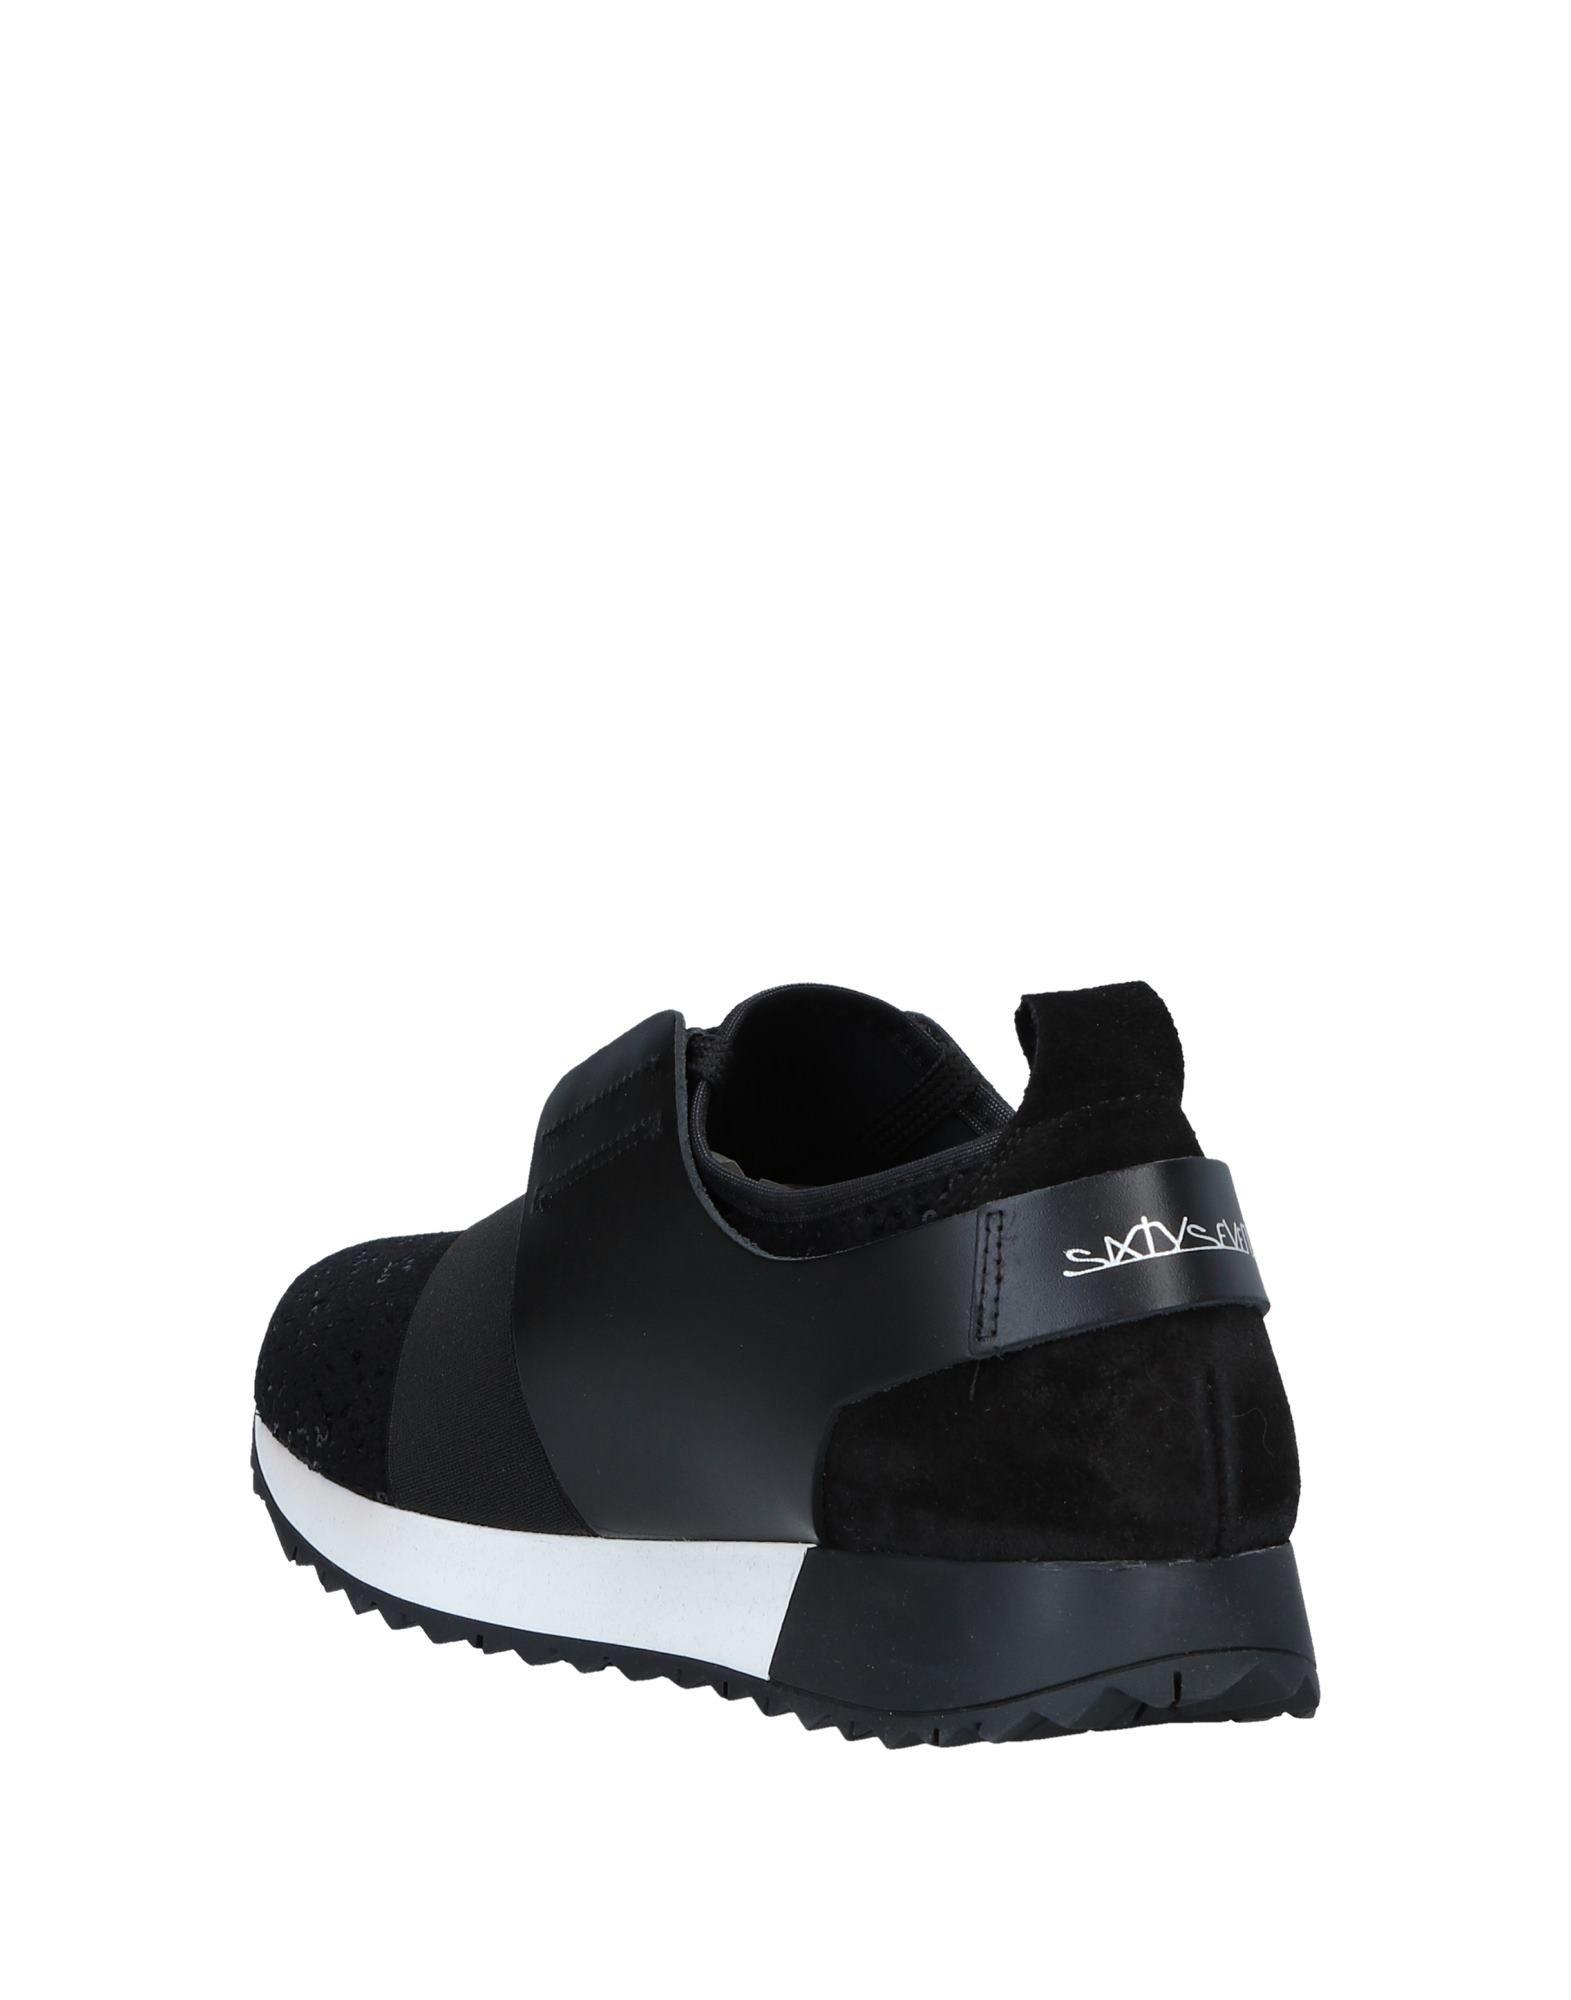 67 Sixtyseven Damen Sneakers Damen Sixtyseven  11542121GR  dcce22